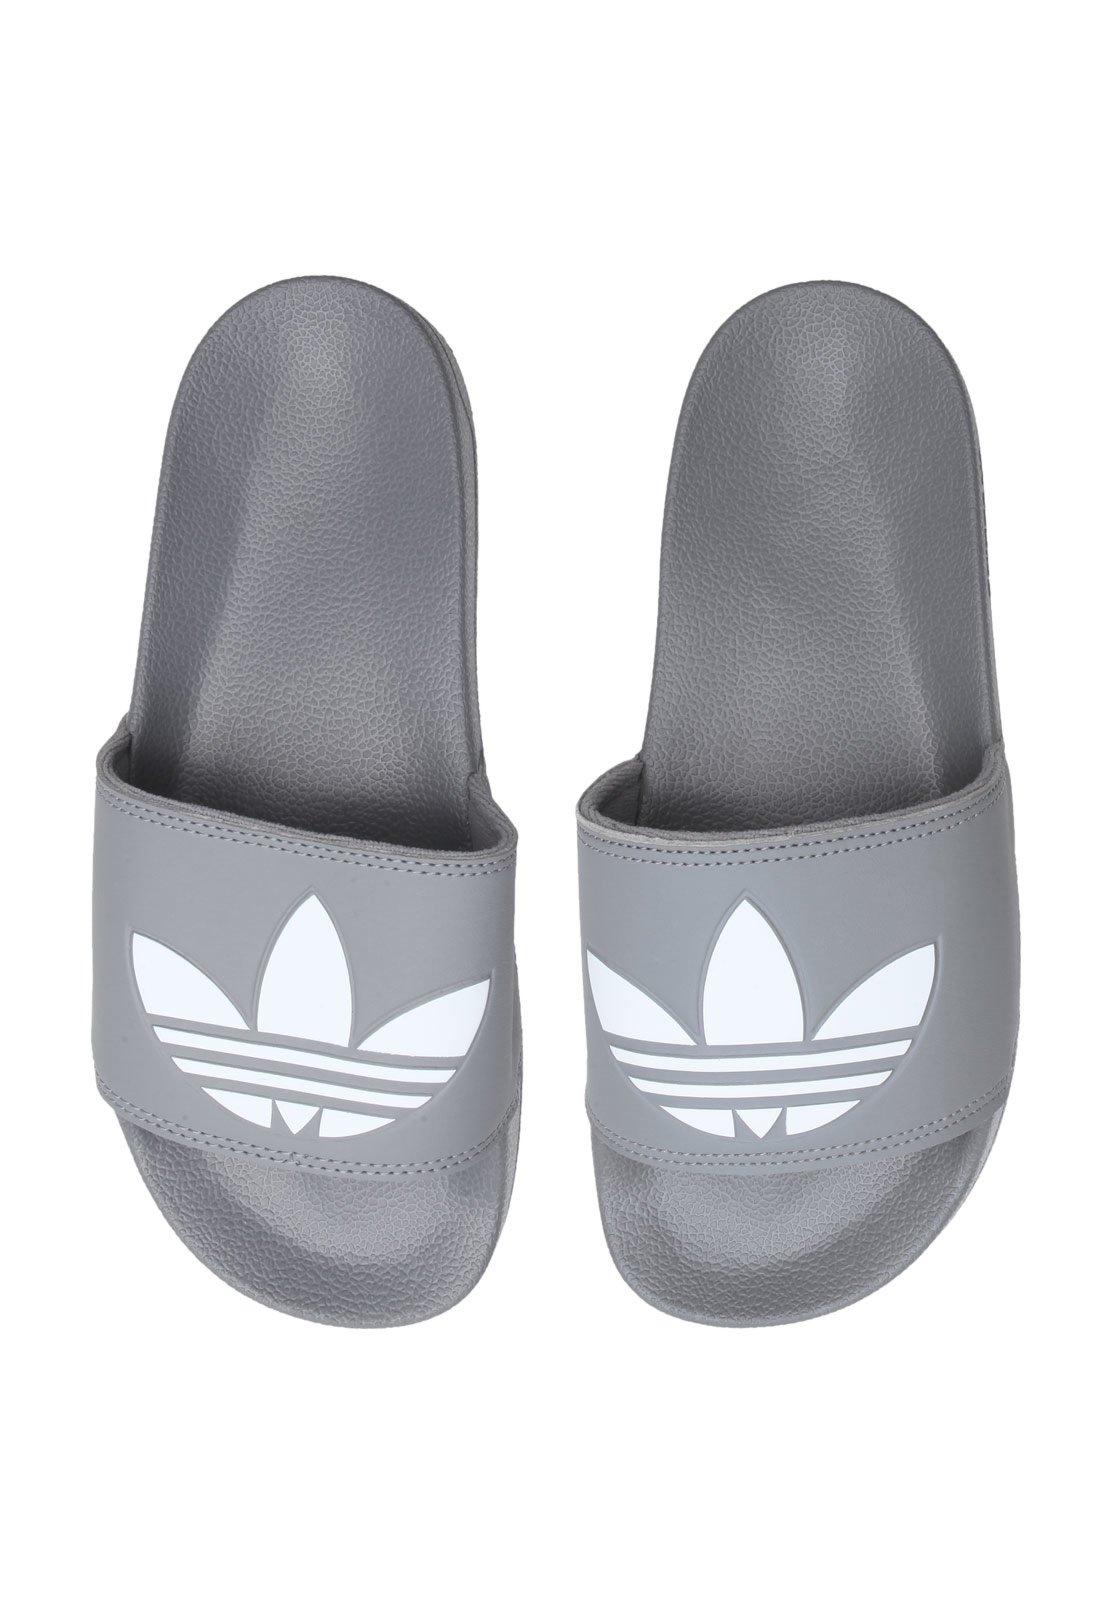 página subasta Escepticismo  Chinelo Slide adidas Originals Adilette Lite Cinza - Compre Agora | Dafiti  Brasil